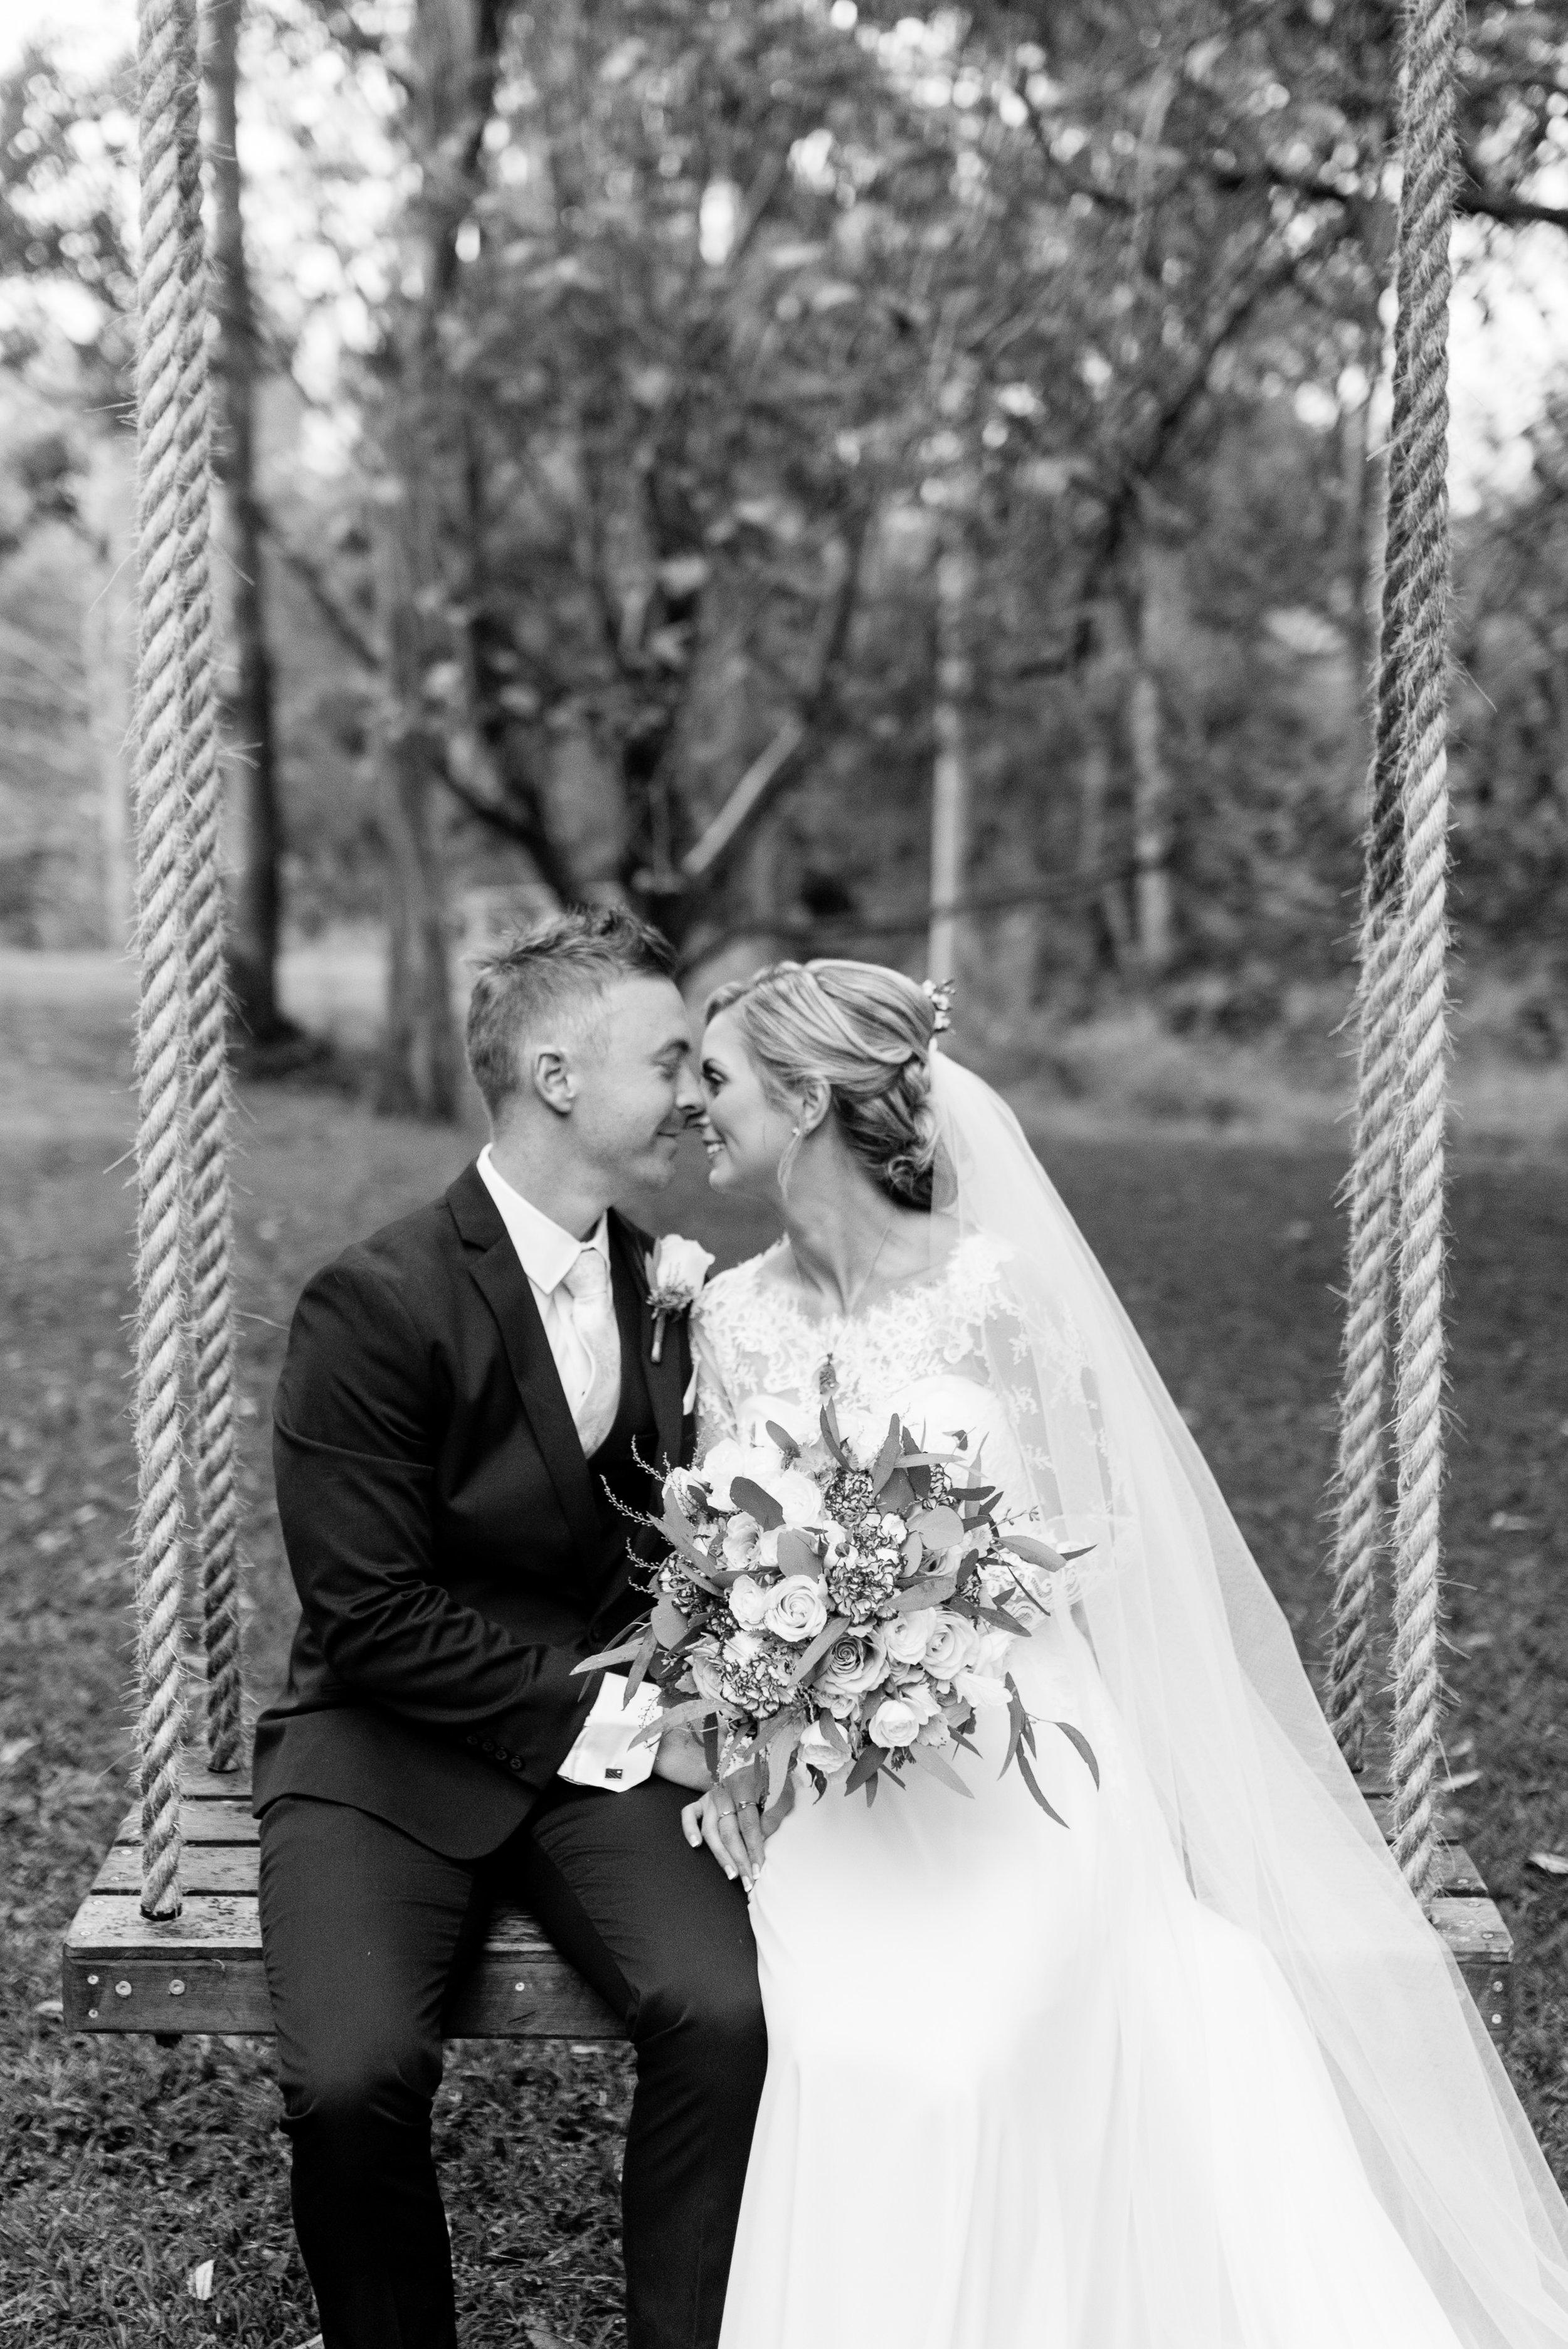 brisbane-gold-coast-sunshine-coast-romantic-wedding-photographer-67.jpg